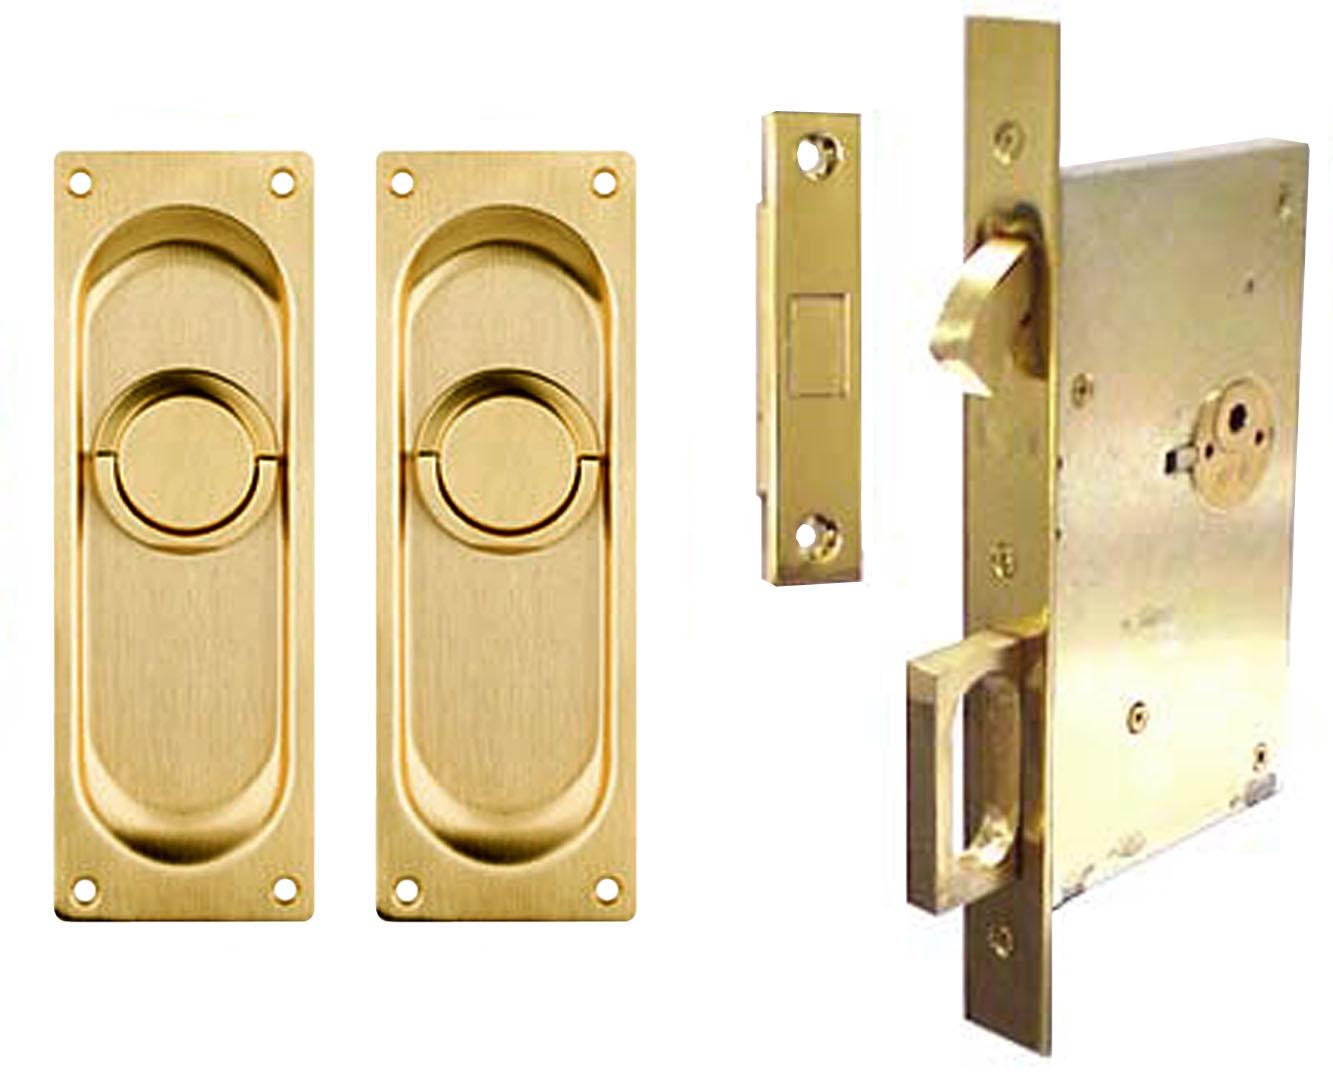 Von Morris Bryn Mawr Pocket Door Lock Pocket Door Hardware Pocket Doors Pocket Door Lock